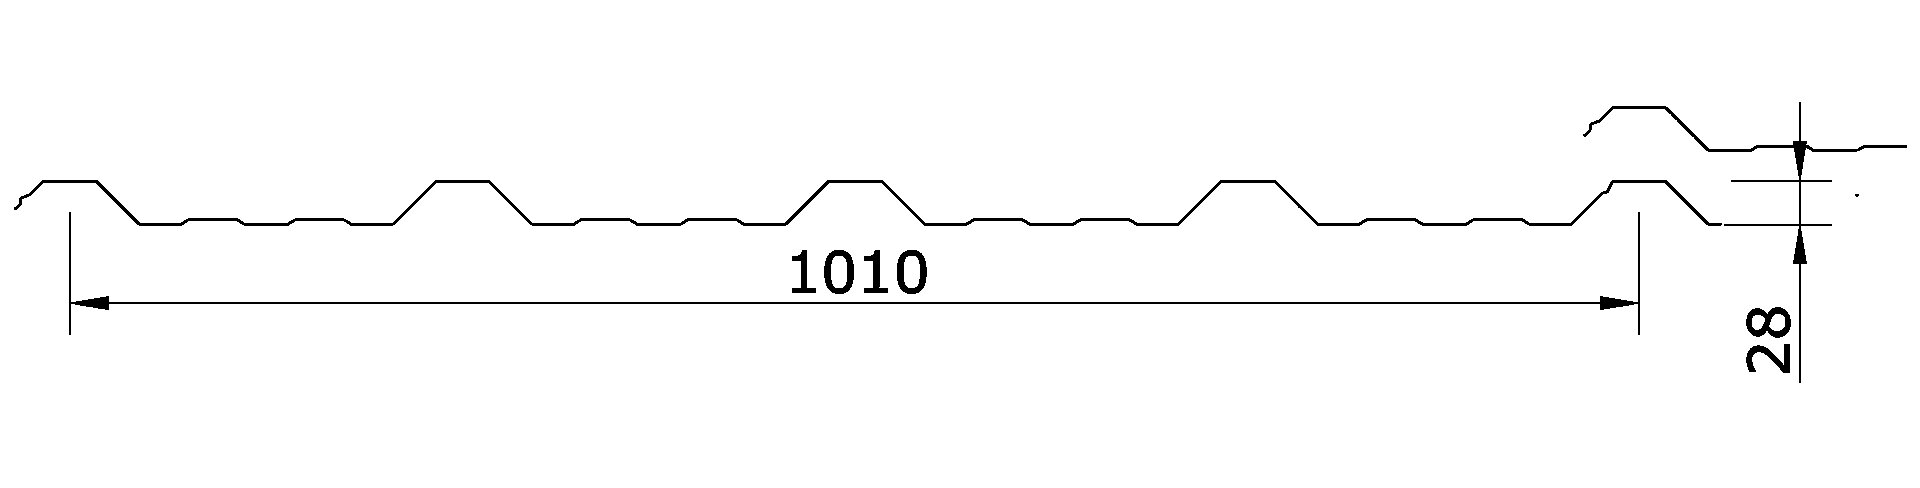 Chapa Trapezoidal T-101